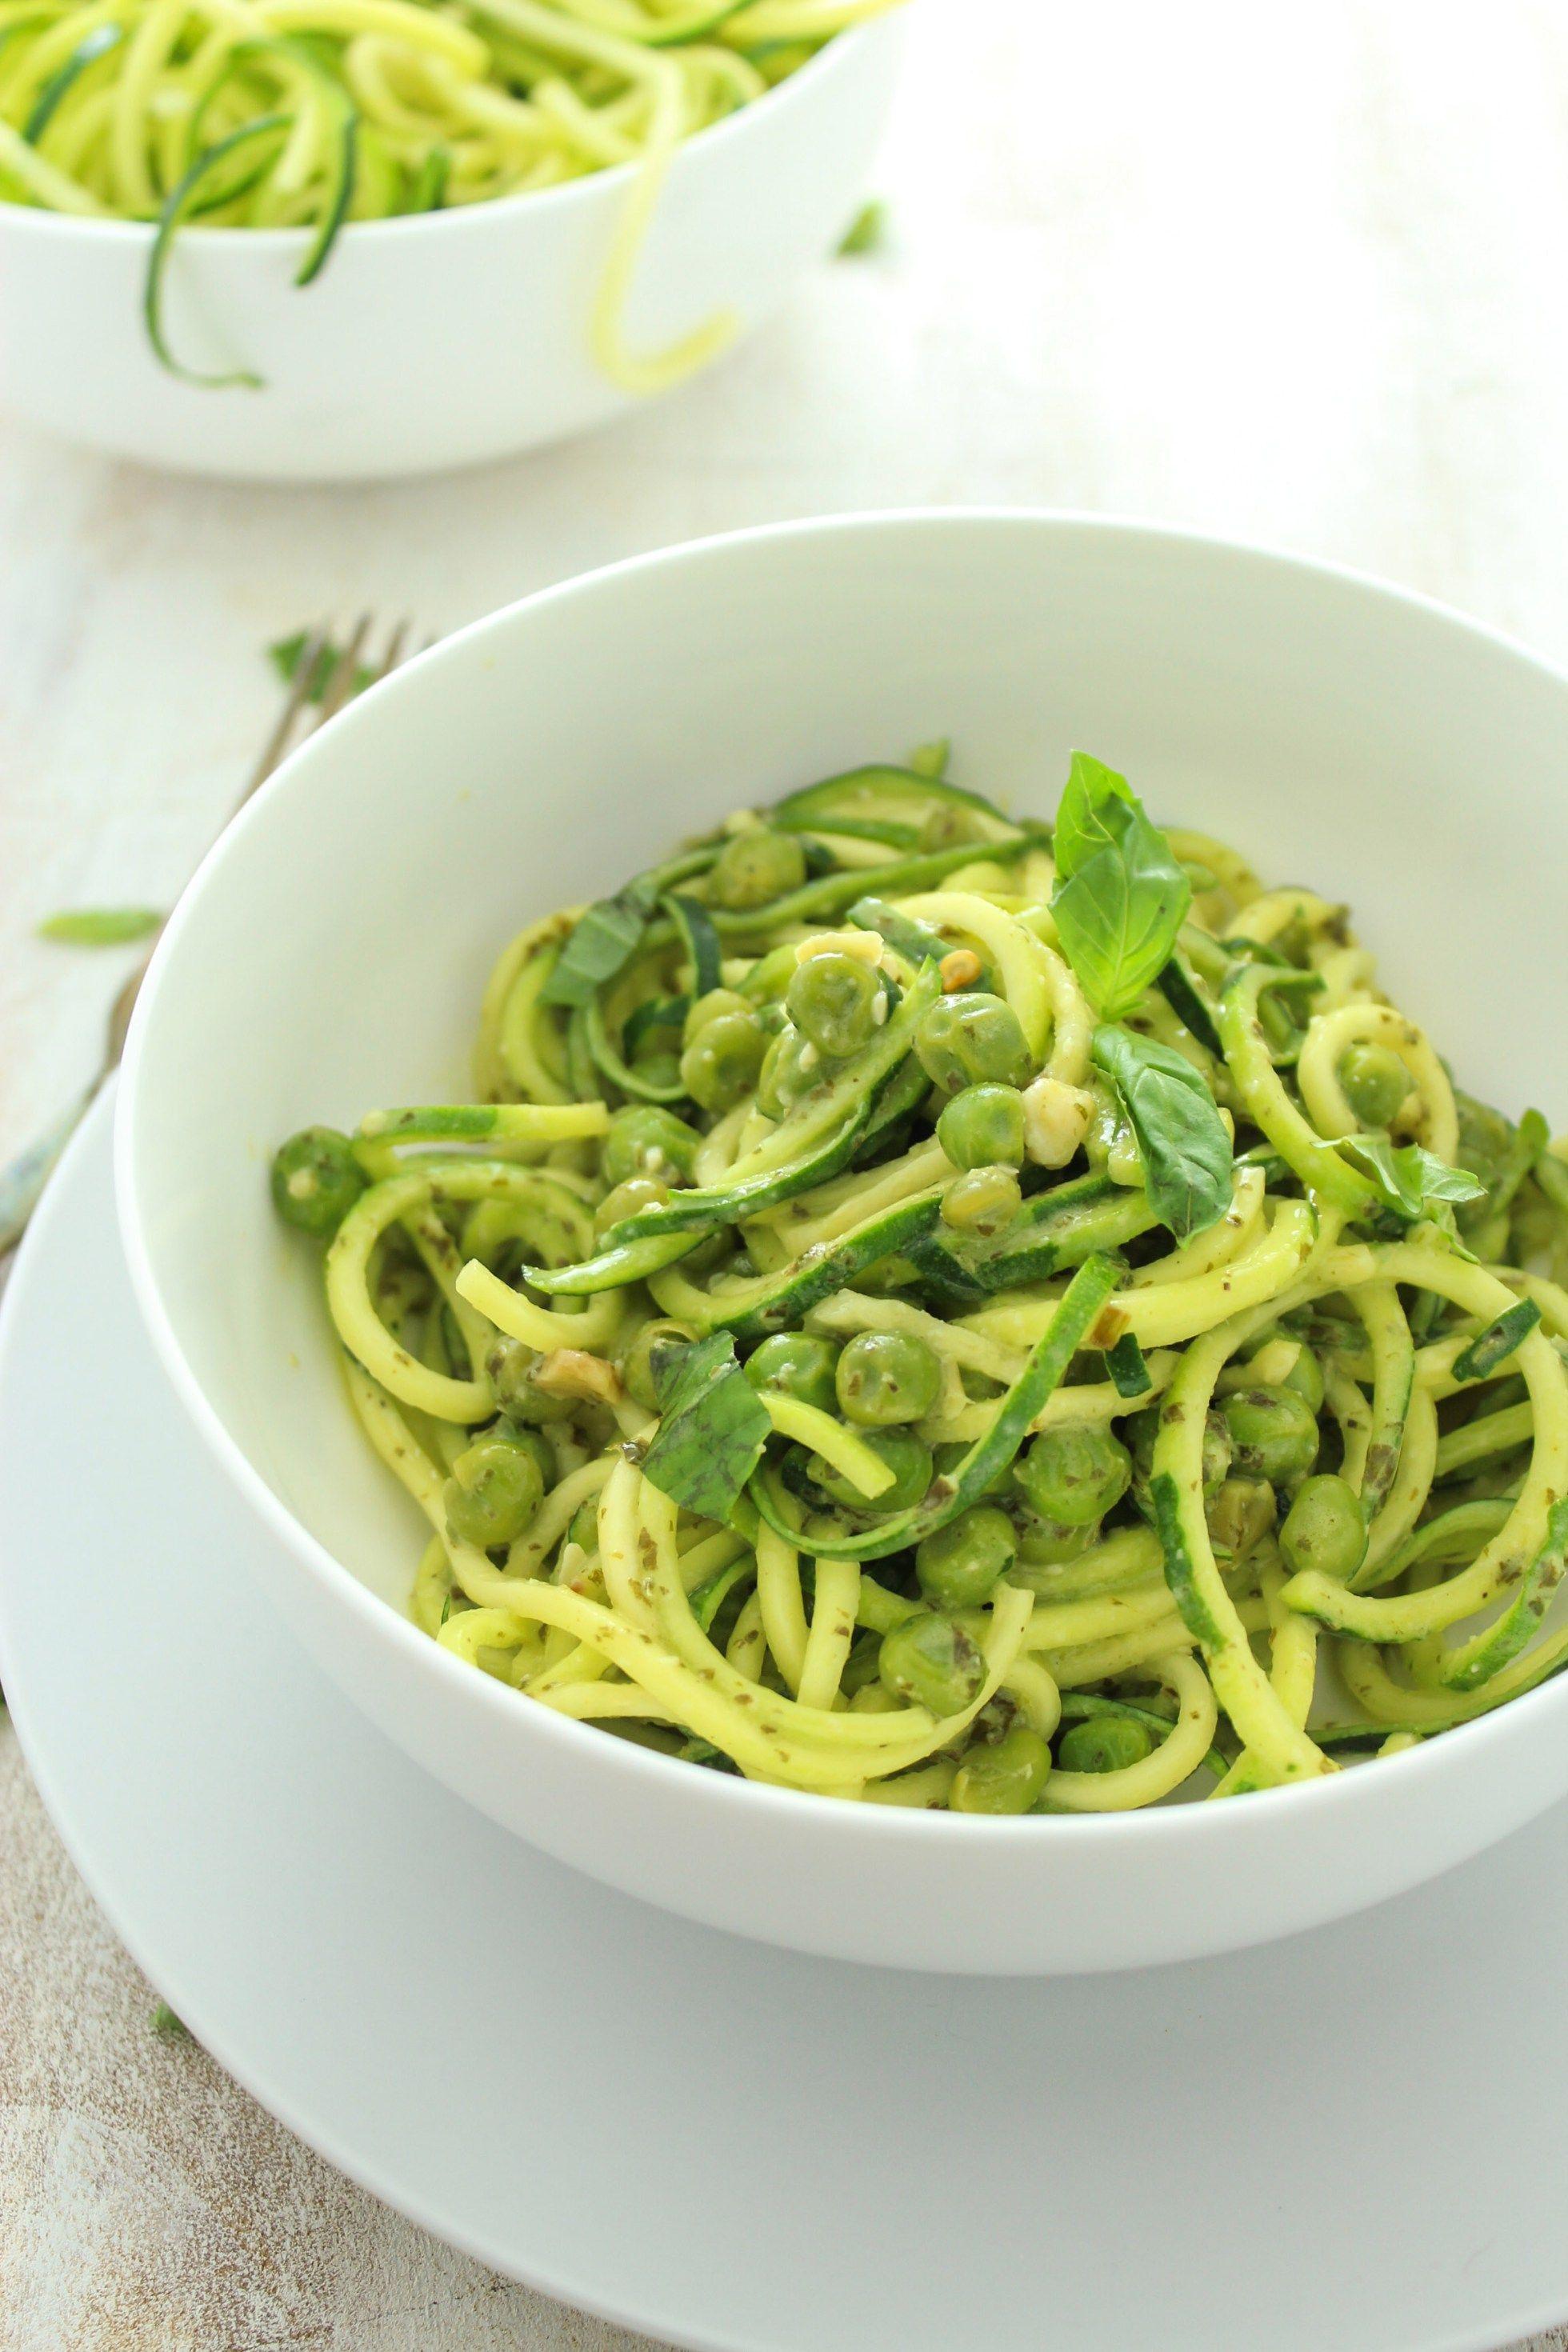 Creamy Pesto Zucchini Noodles With Peas